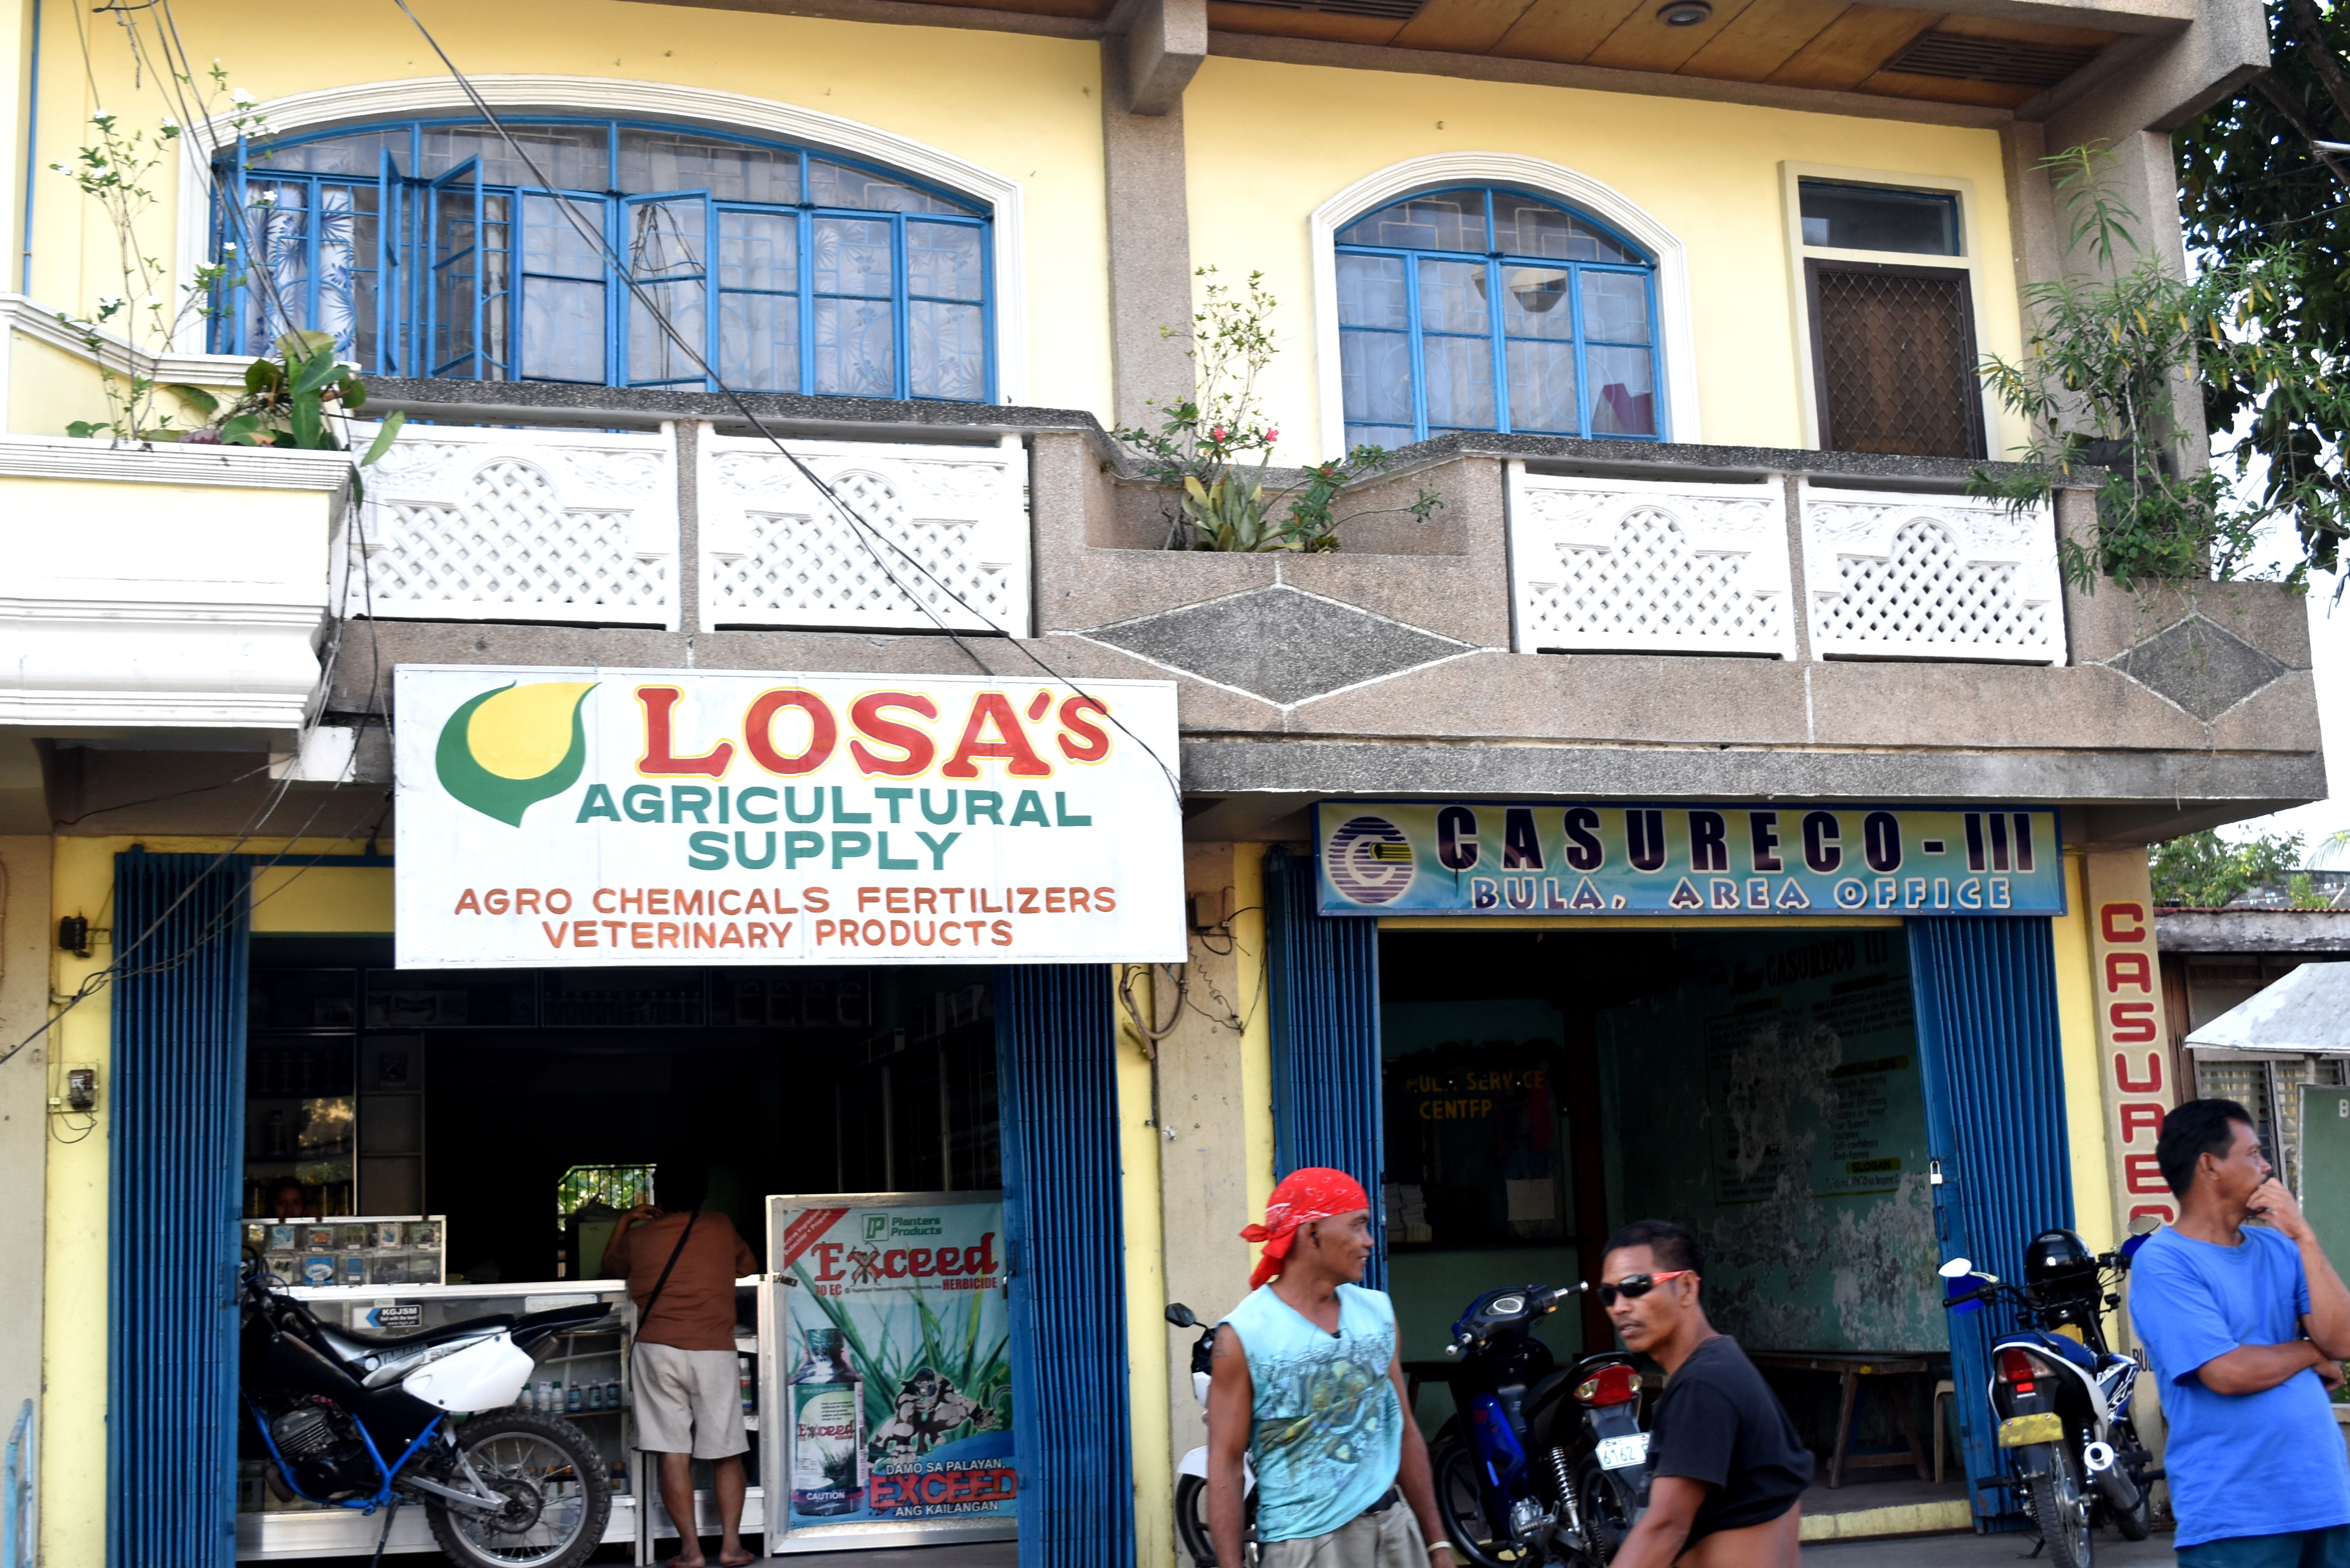 File:Losa's Agri Supply JPG - Wikimedia Commons